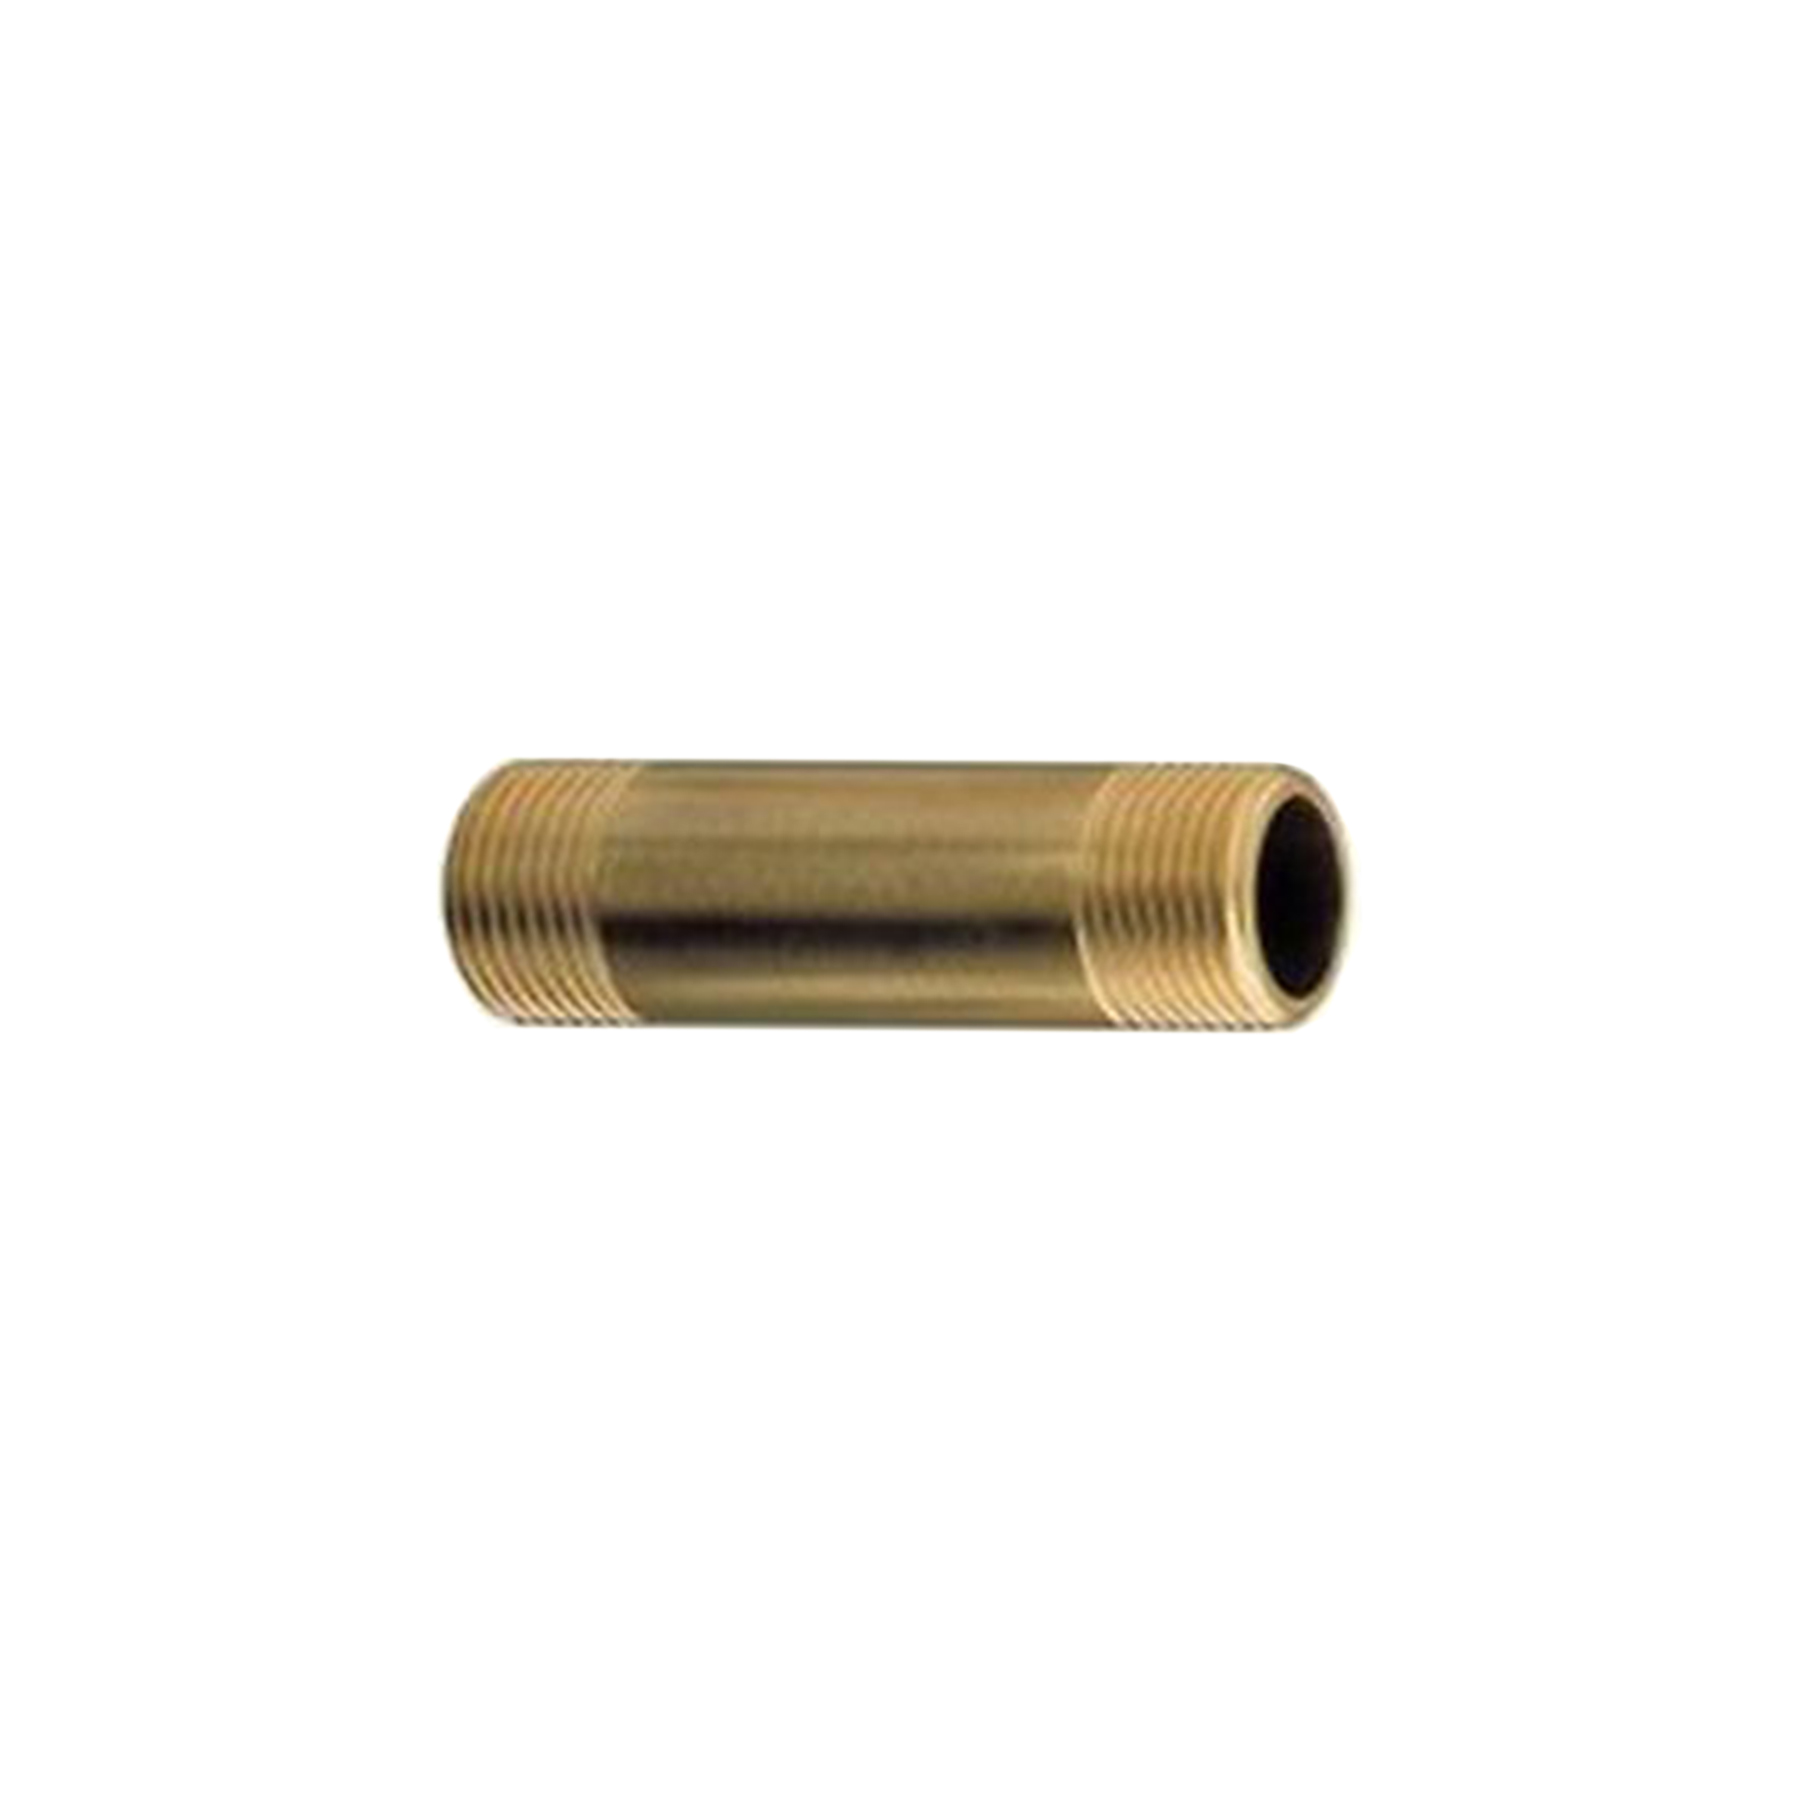 Brass Nipple Fitting, 1/2 in. NPT x 2-1/2 in.